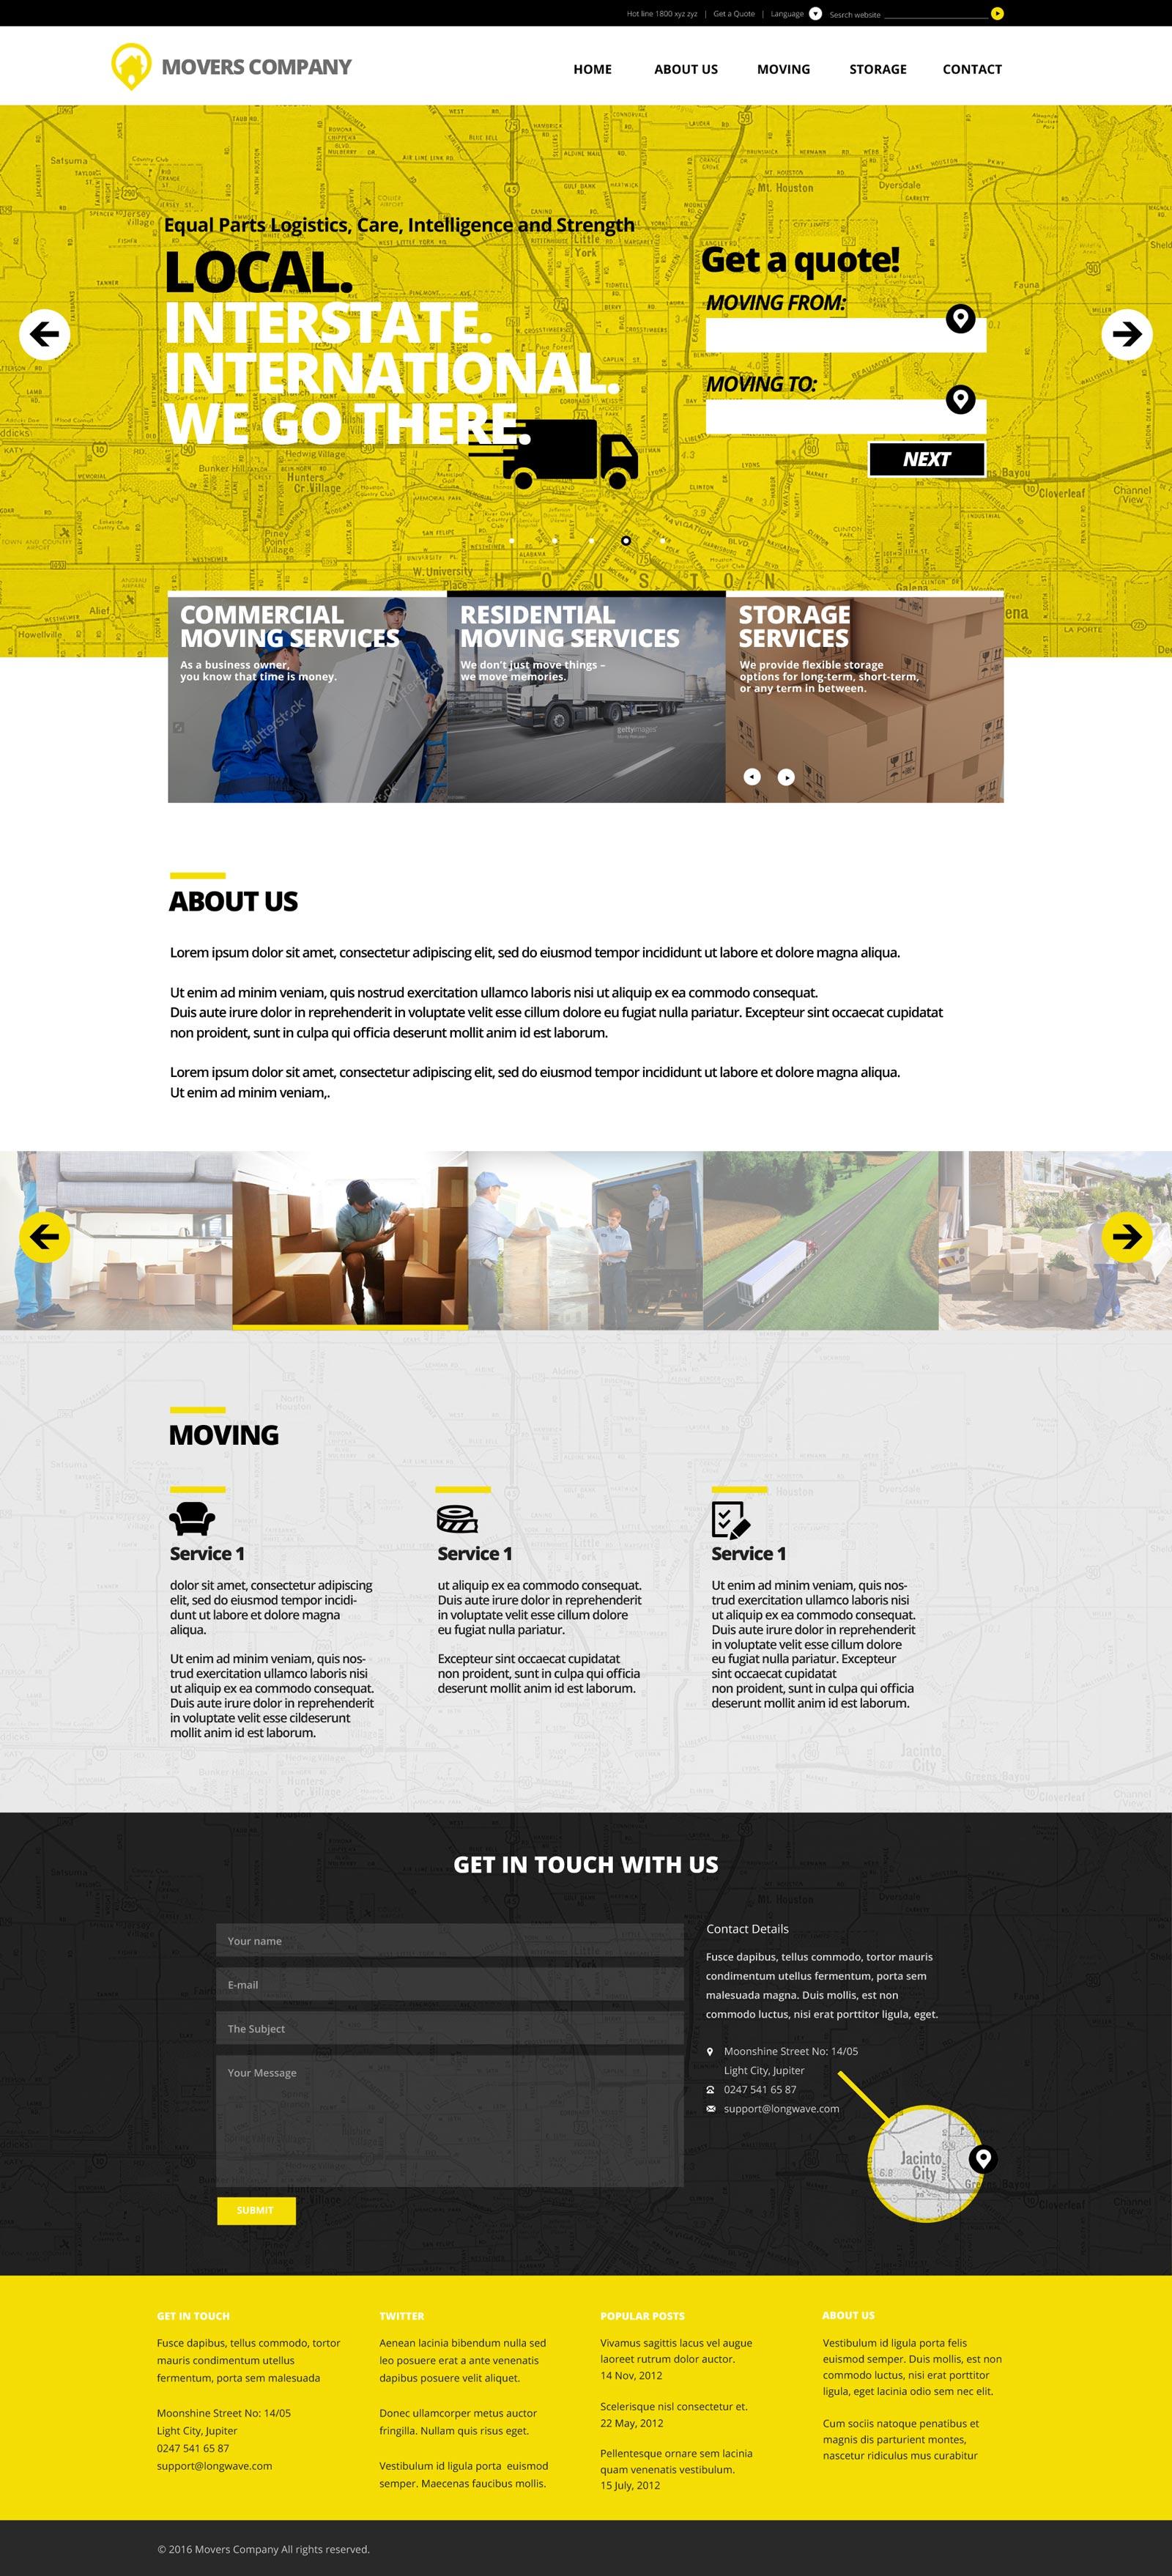 Design 2 Yellow